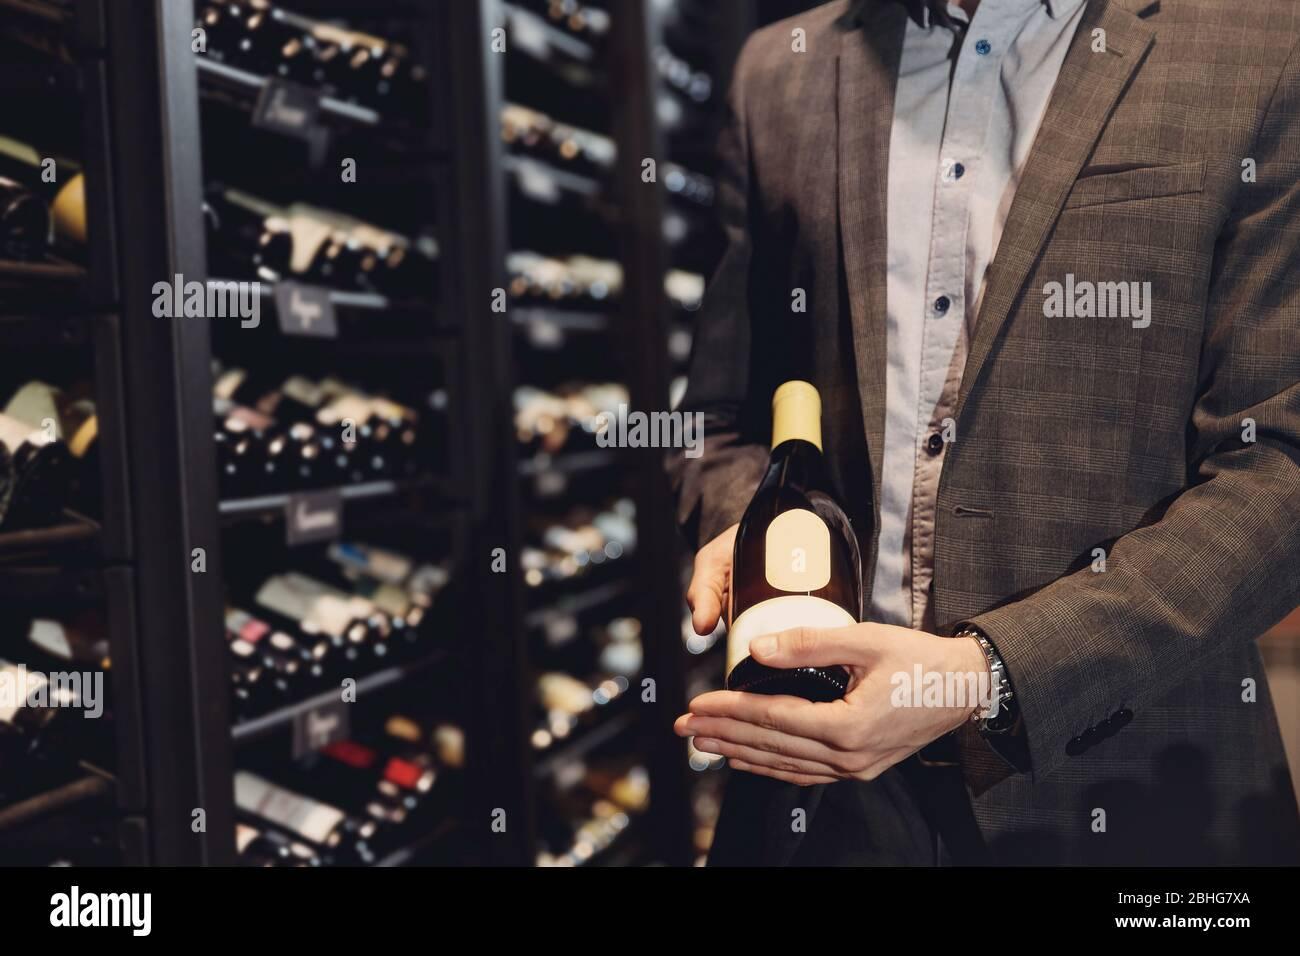 Bartender sommelier picks bottle of wine from rack in restaurant with exquisite drinks Stock Photo